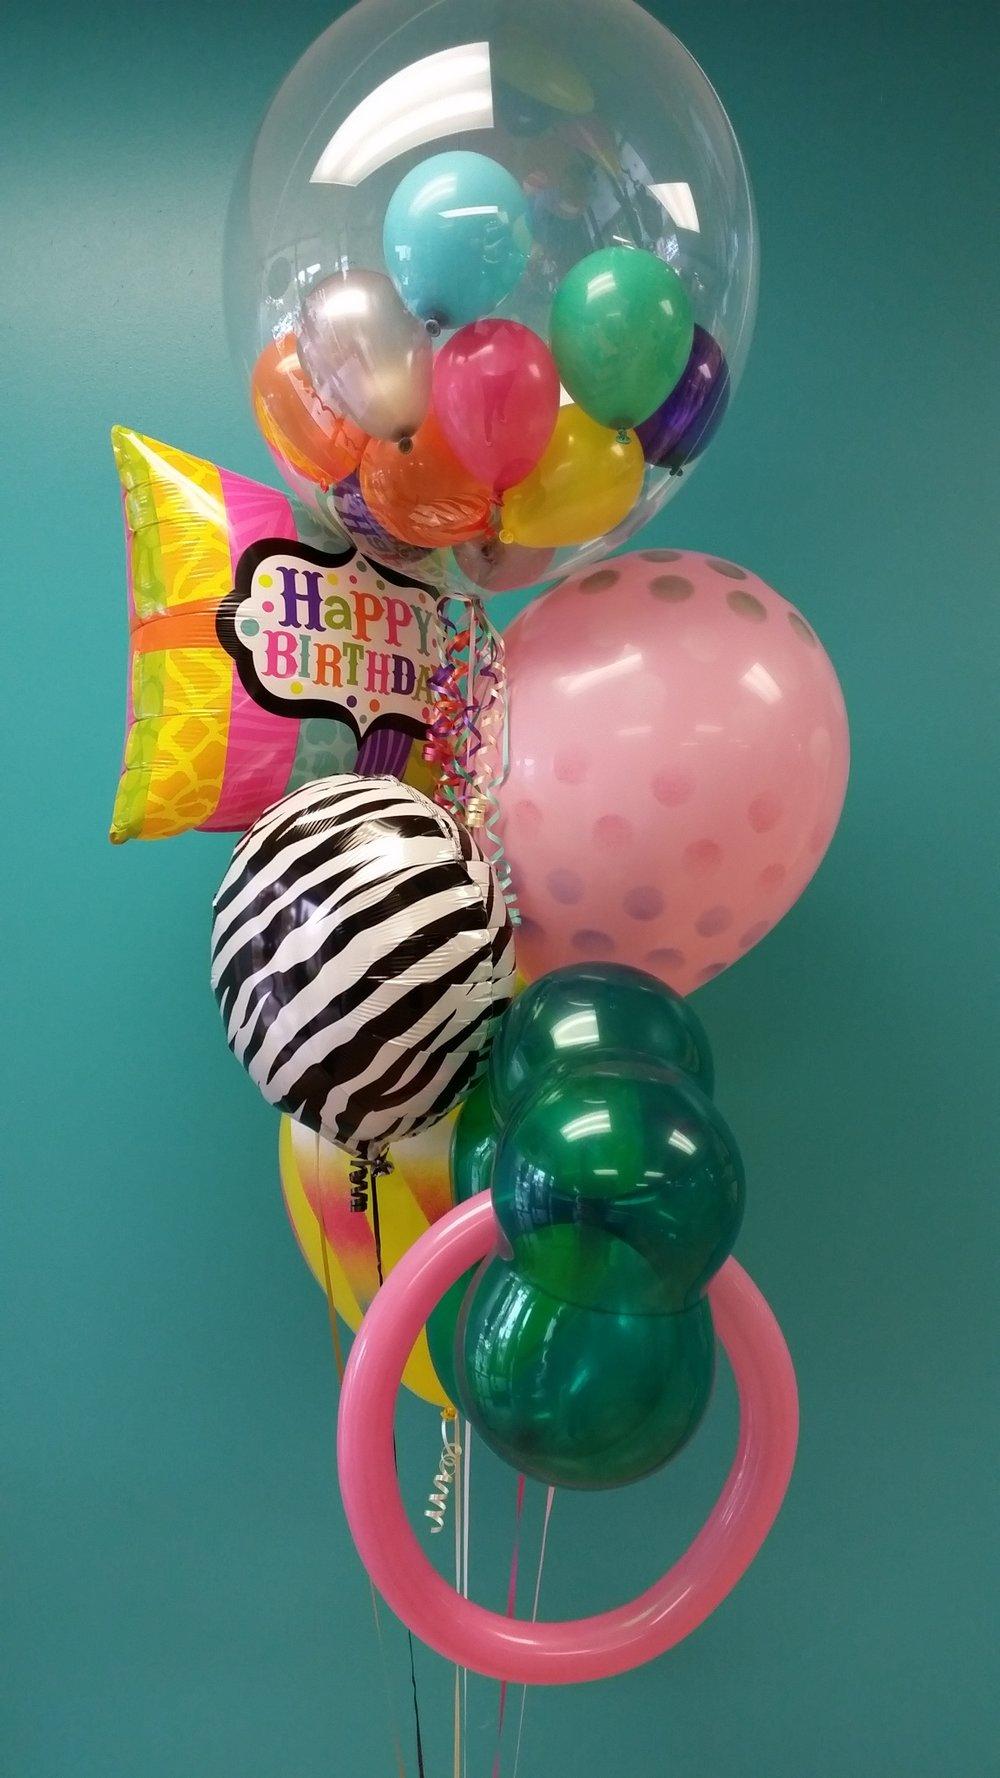 Happy birthday bouqet.jpg